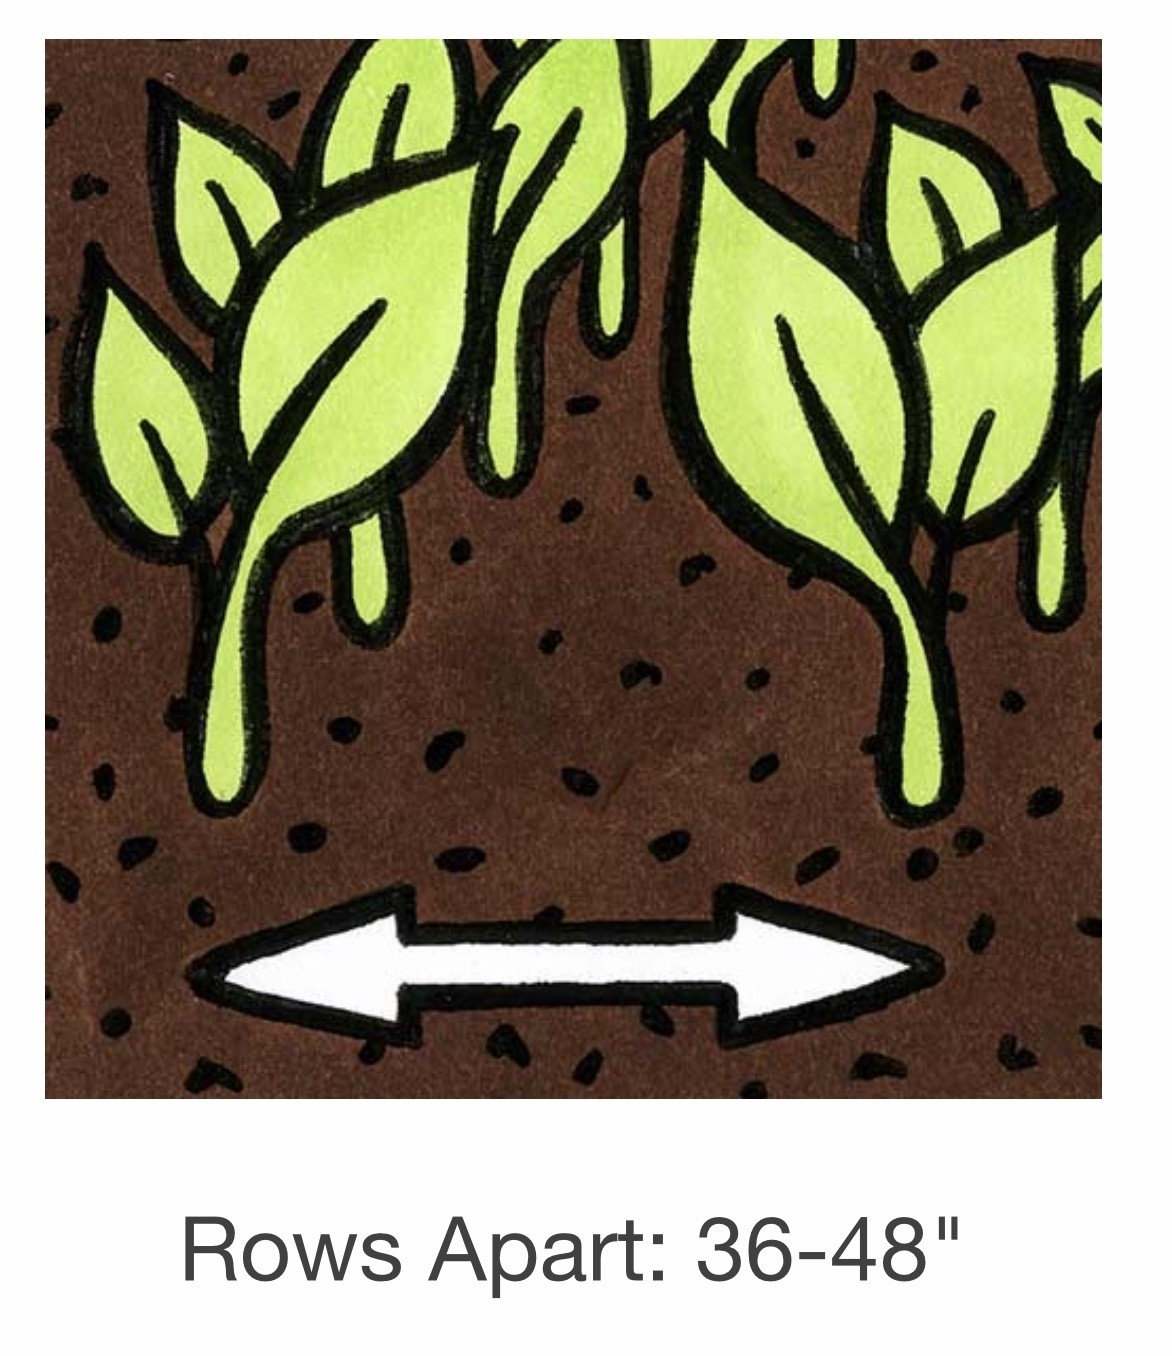 Seed Savers Exchange Corn Seeds - Two Inch Strawberry Popcorn (organic)